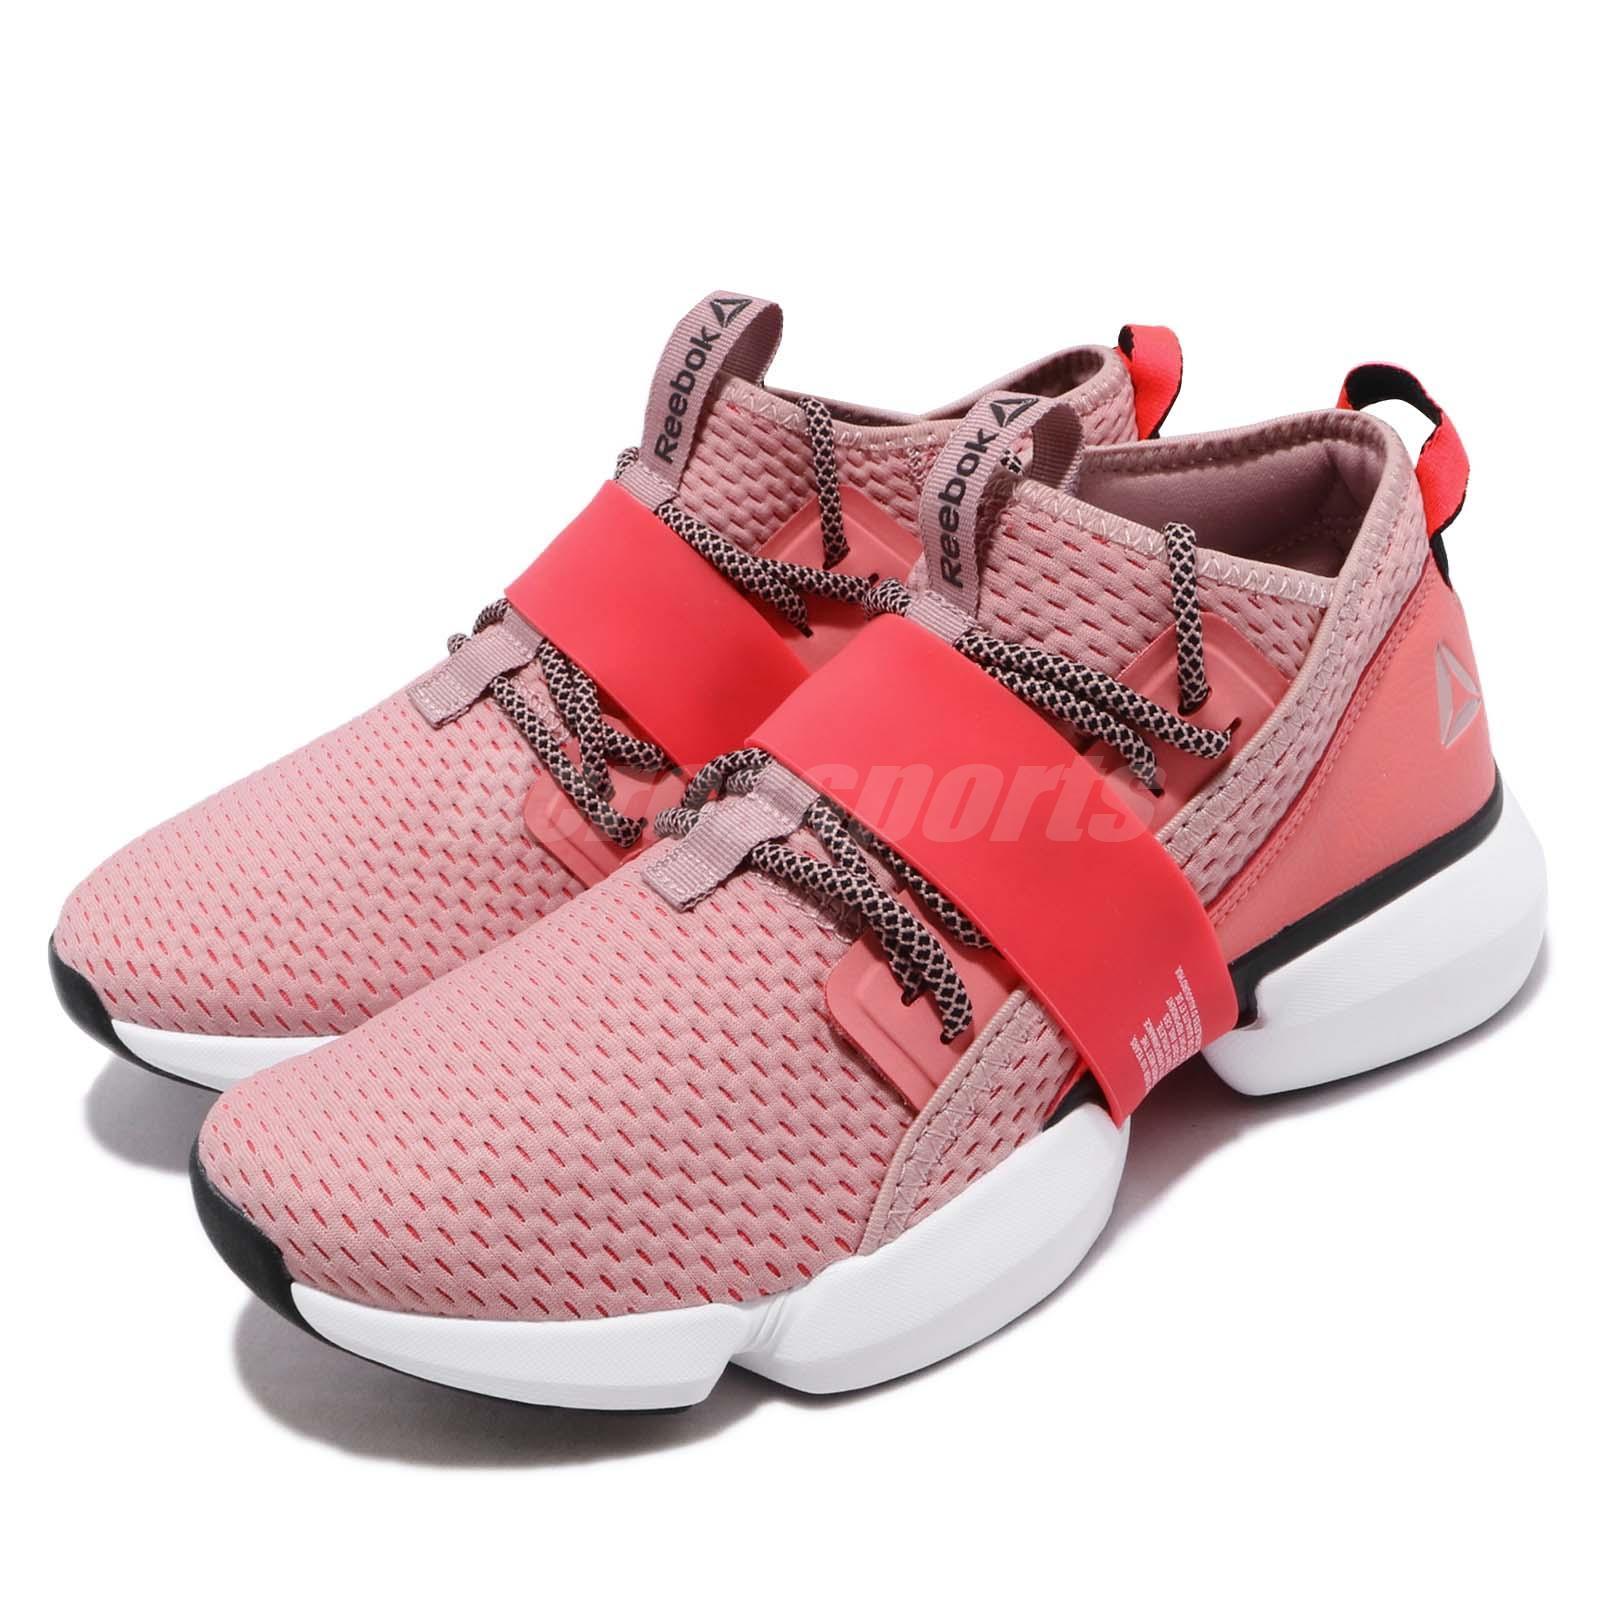 Details about Reebok Split Flex Rose Red White Black Women Cross Training Shoes Sneaker DV3960